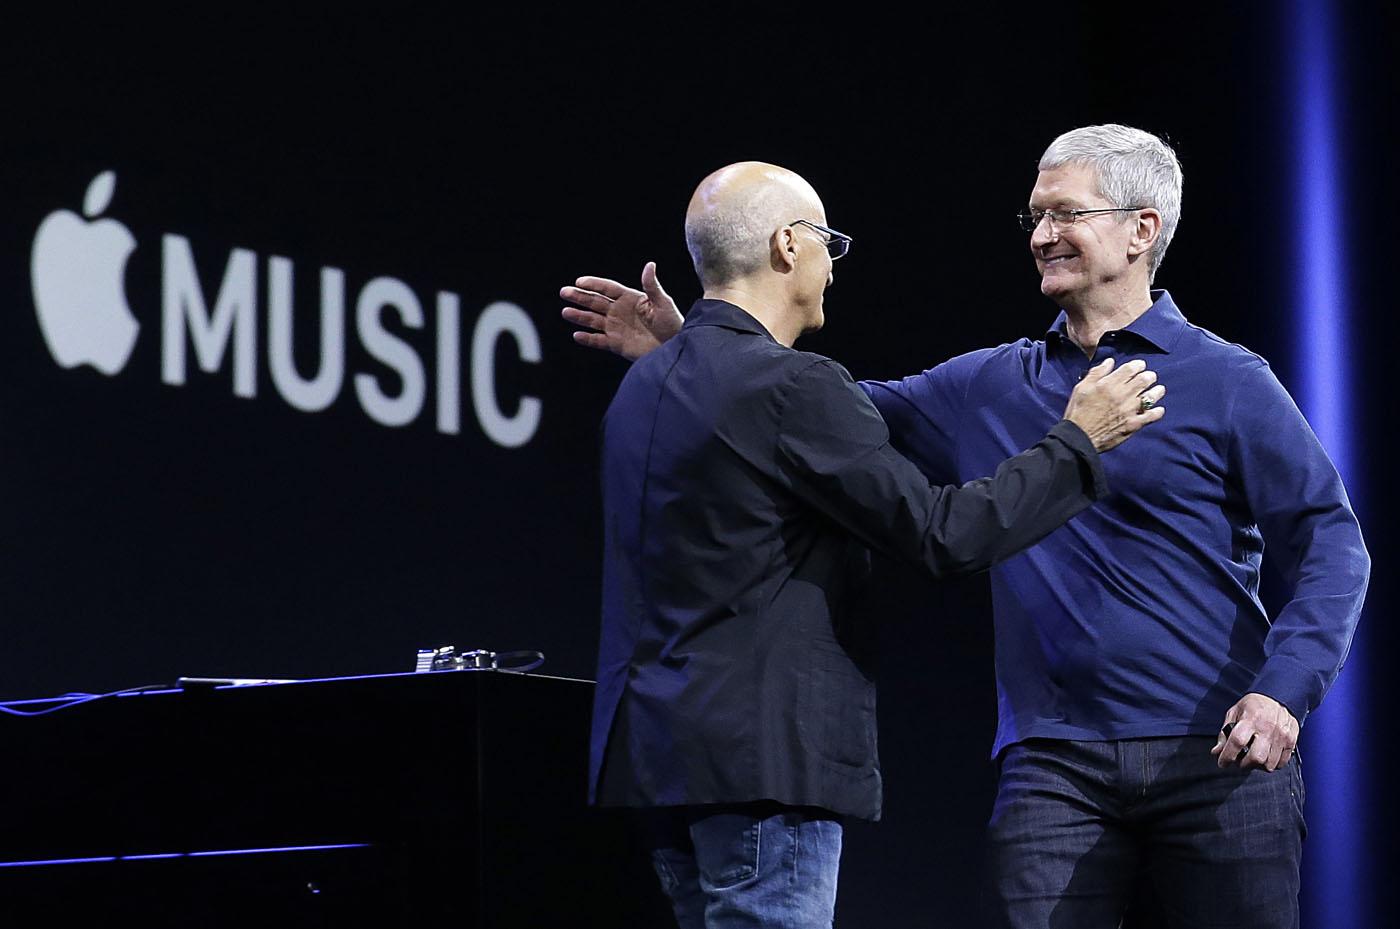 Brussels, apple, store, apple (BE) Apple opens in, belgium 's first Rumored, apple, stores : NYC, LA, Toronto, Paris and More - Mac Rumors